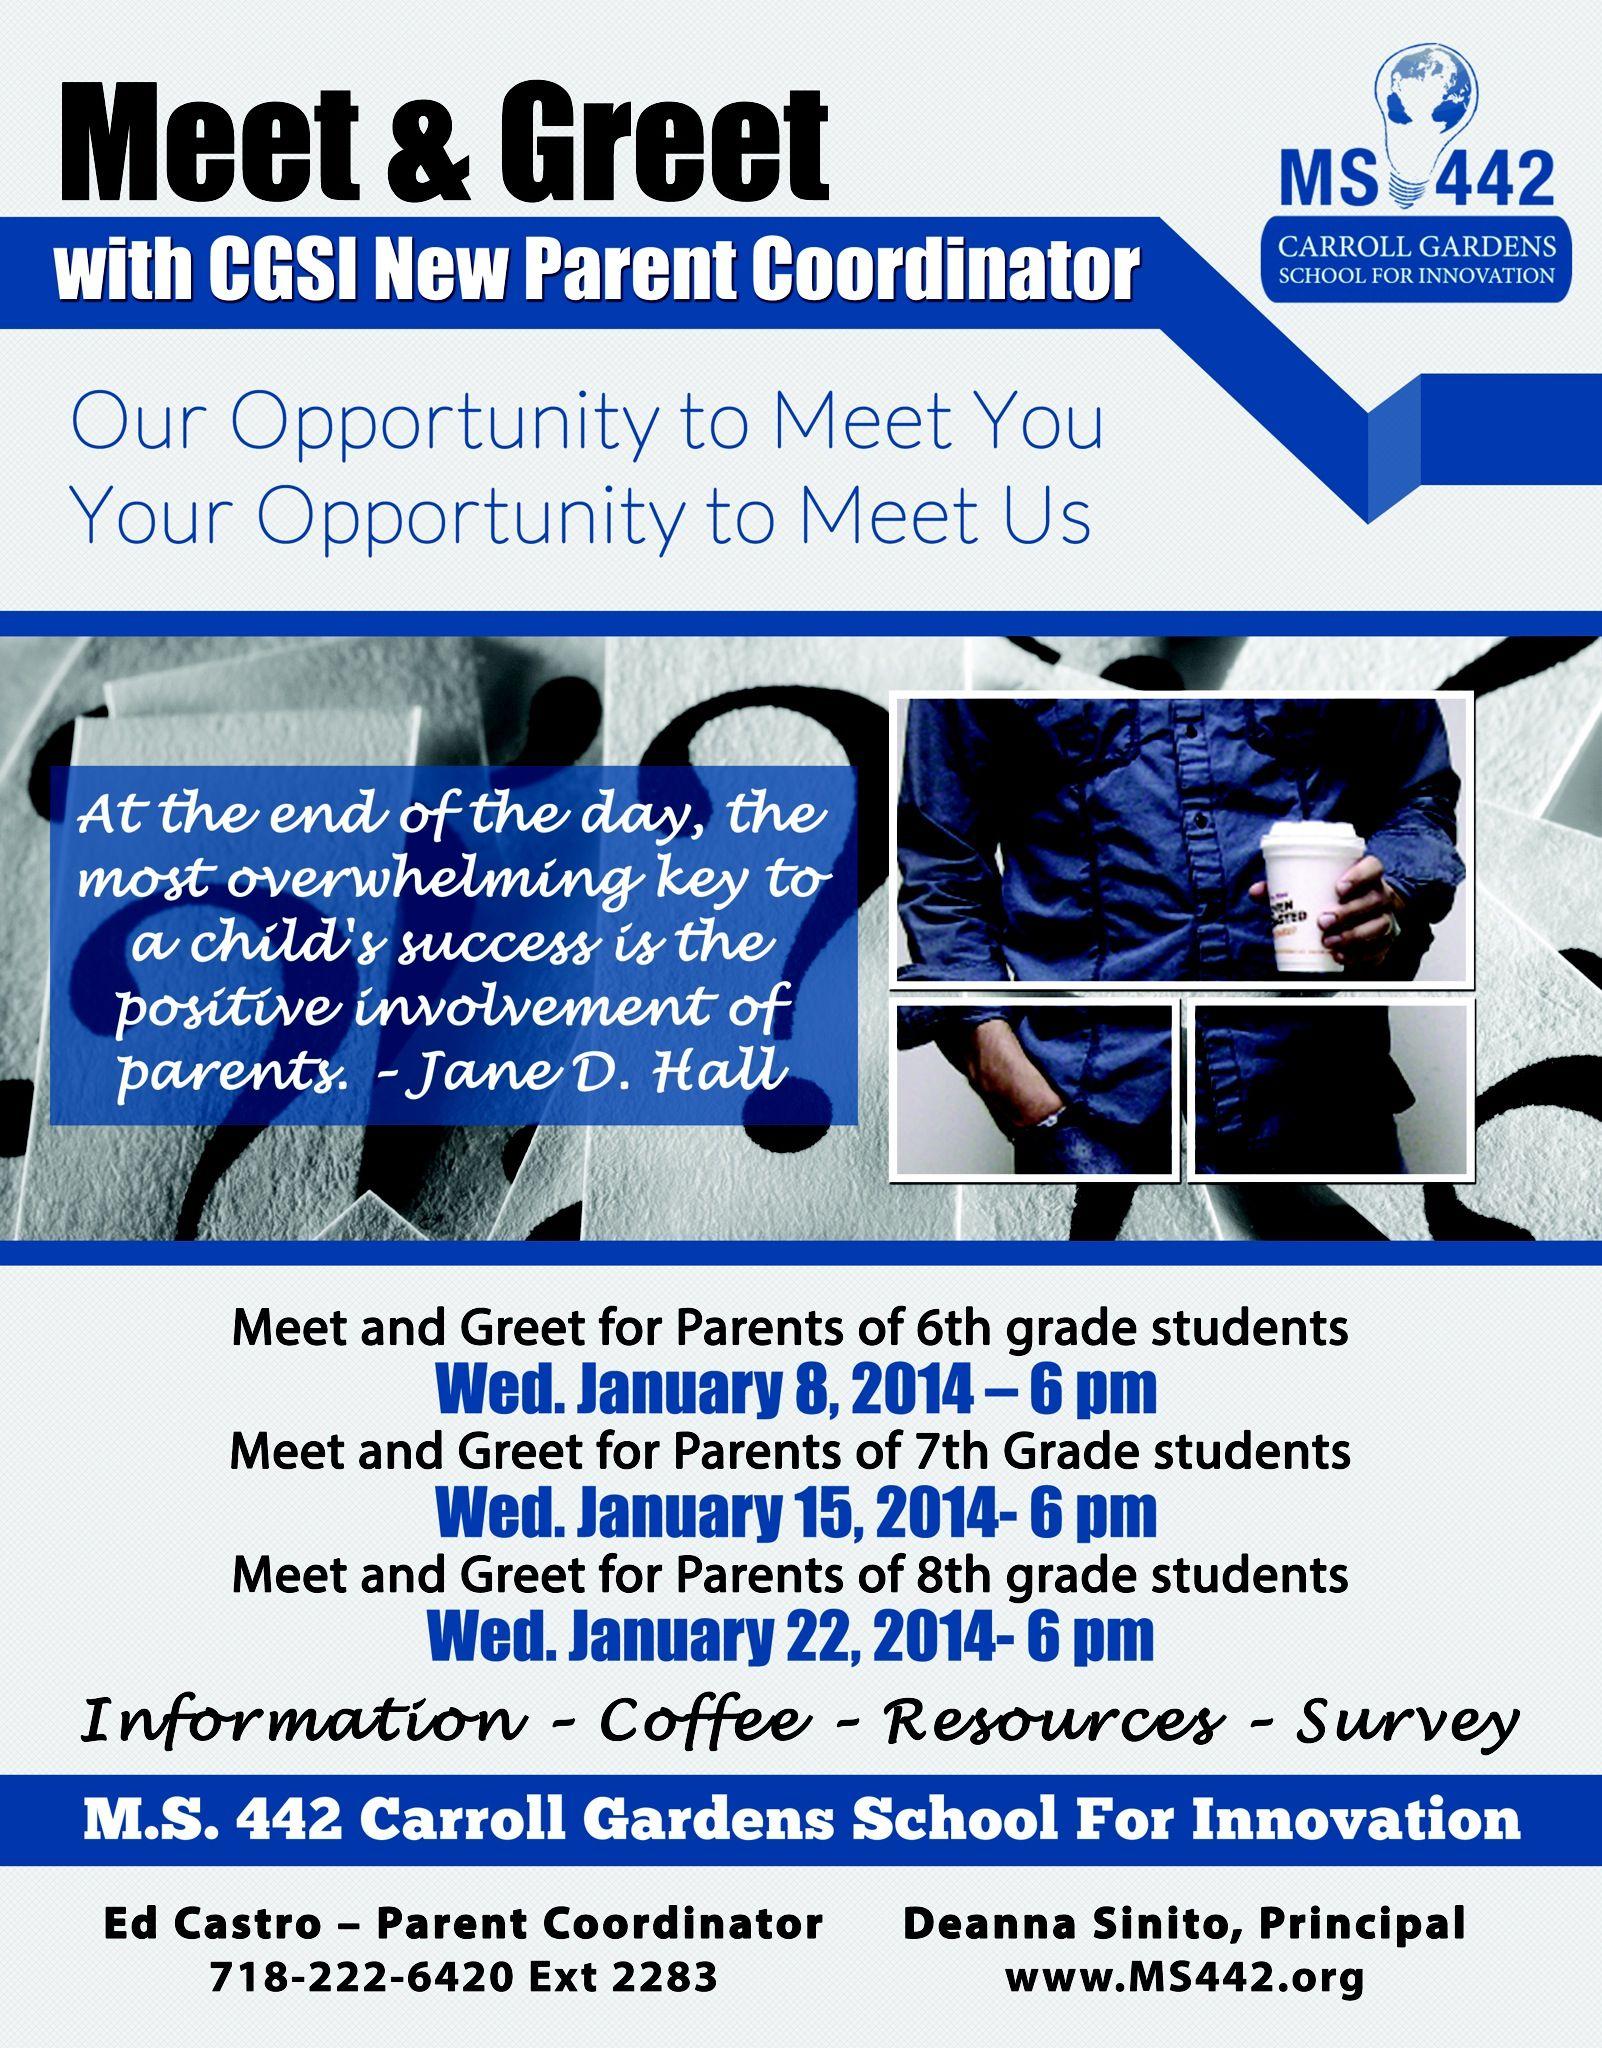 Parent meet and greet flyer google search meet and greet parent meet and greet flyer google search kristyandbryce Choice Image